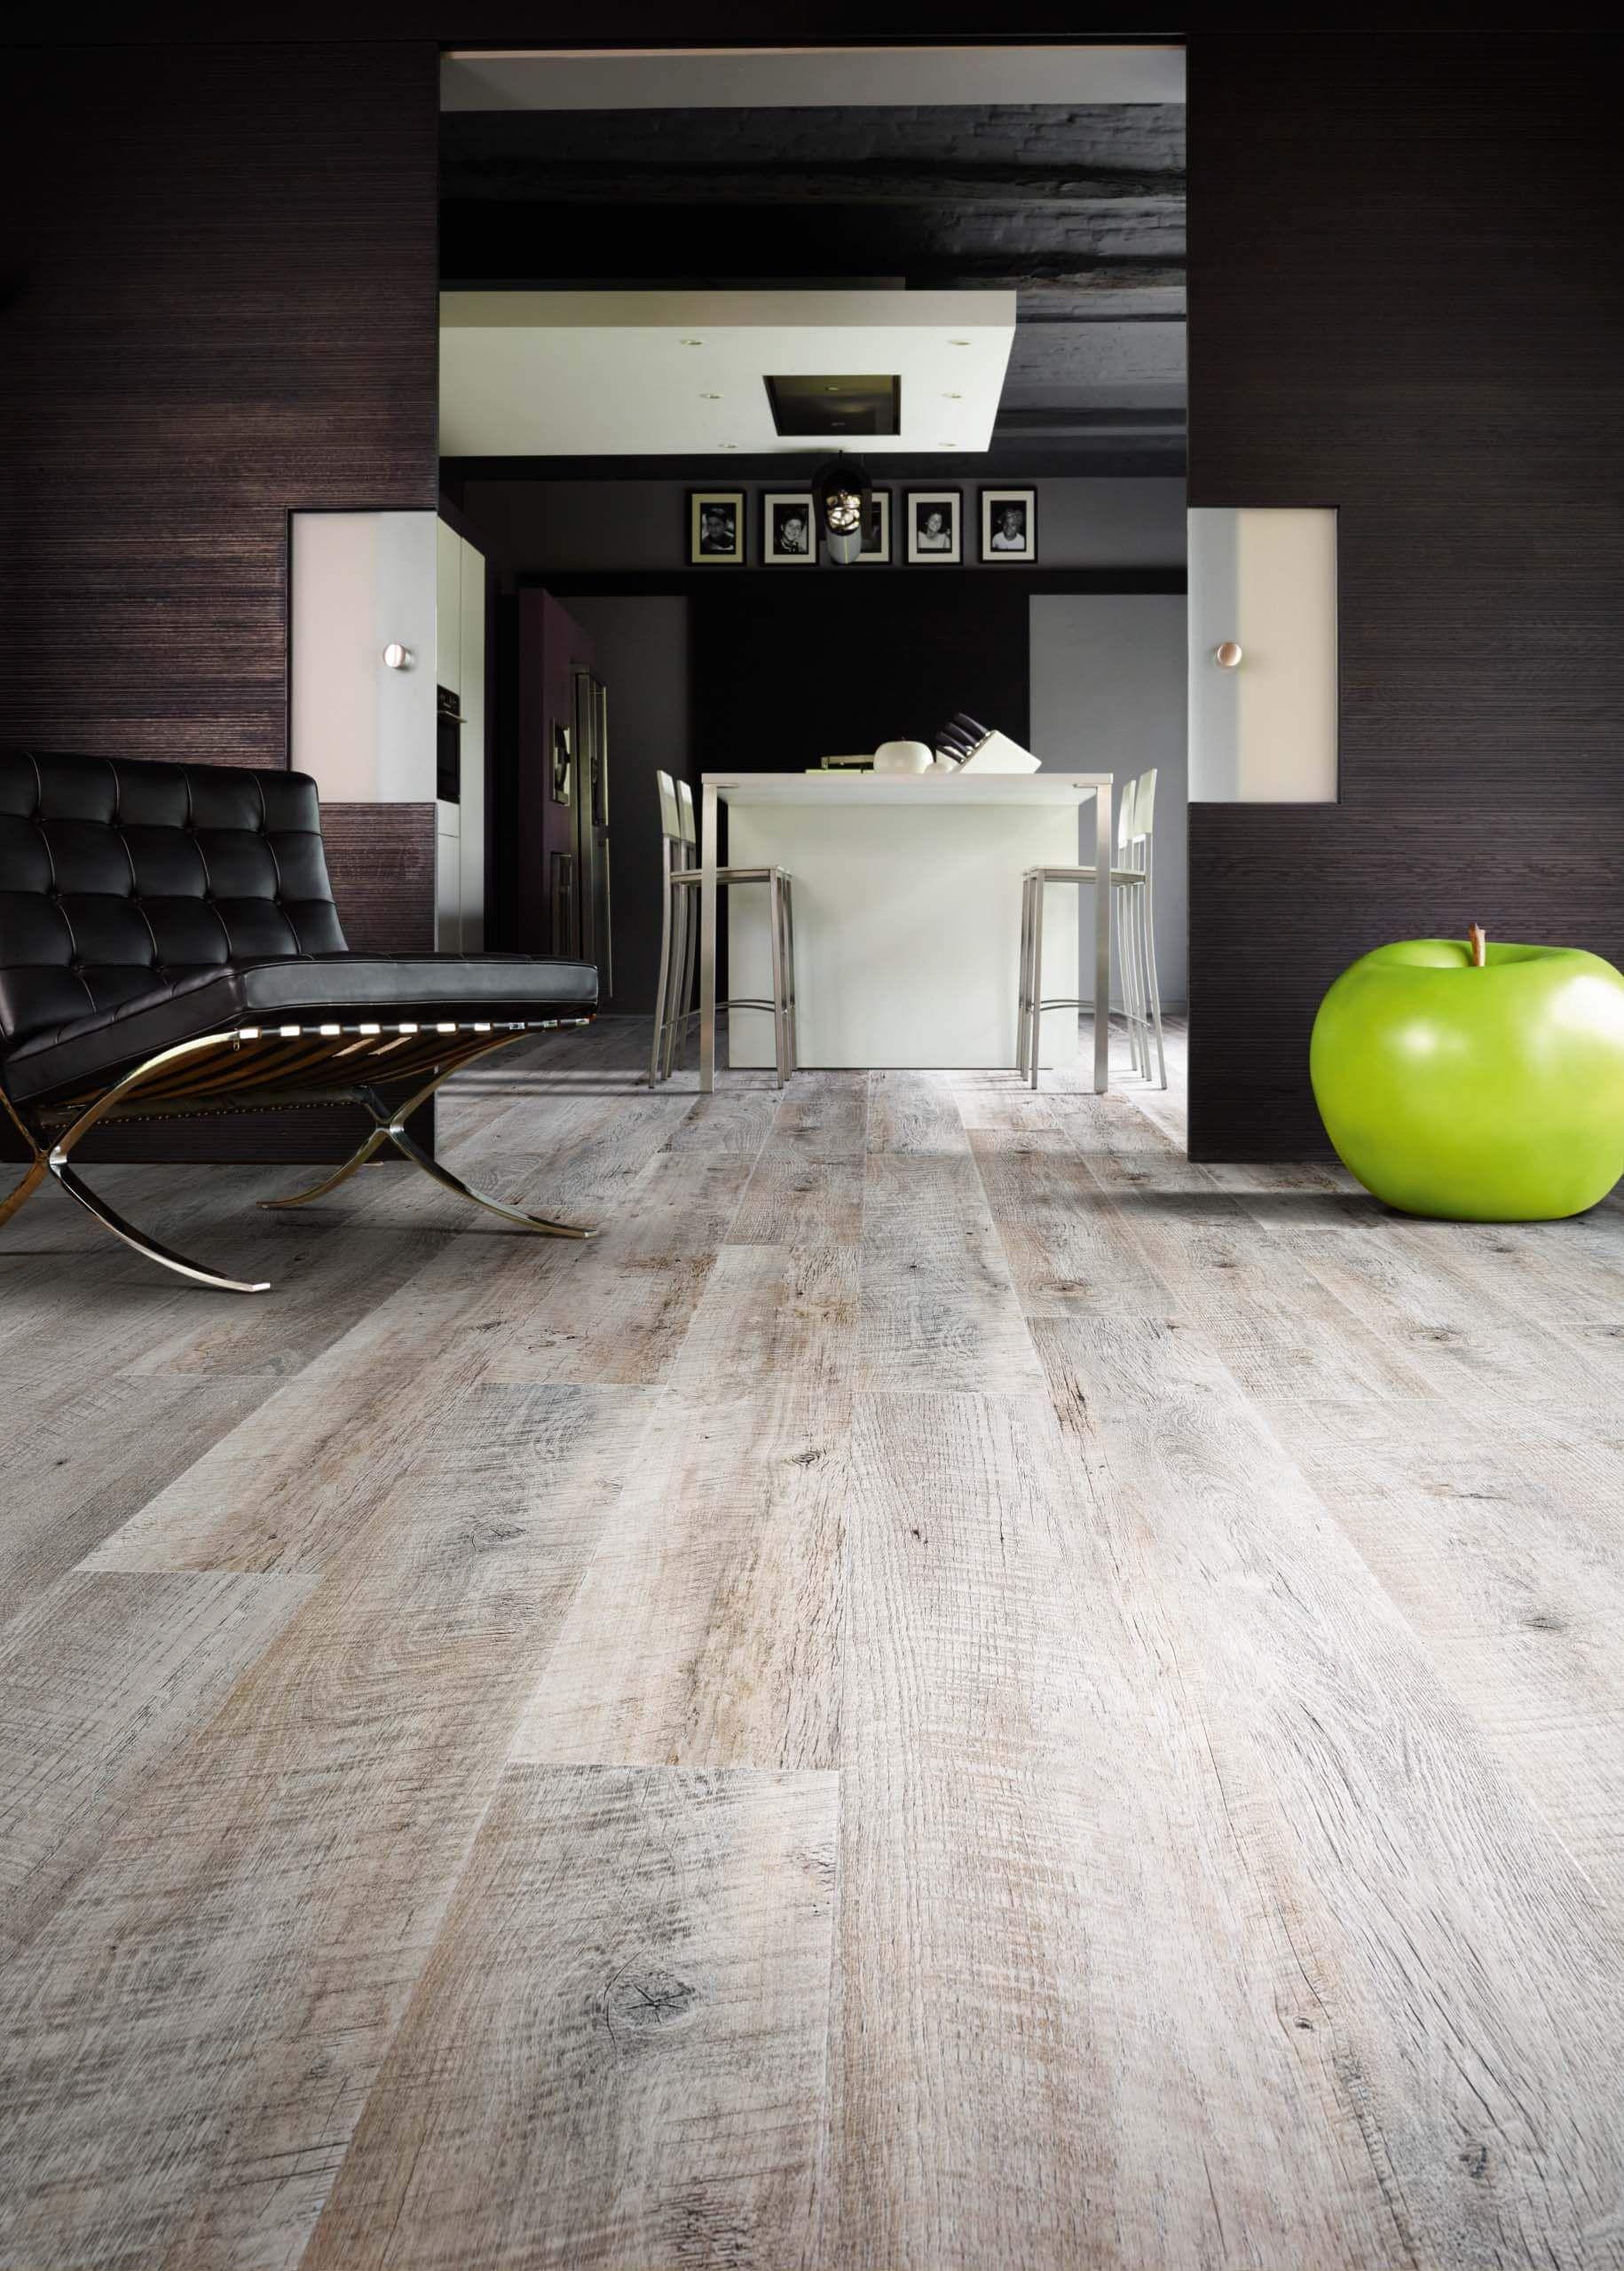 castle oak 55935 - wood effect luxury vinyl flooring - moduleo